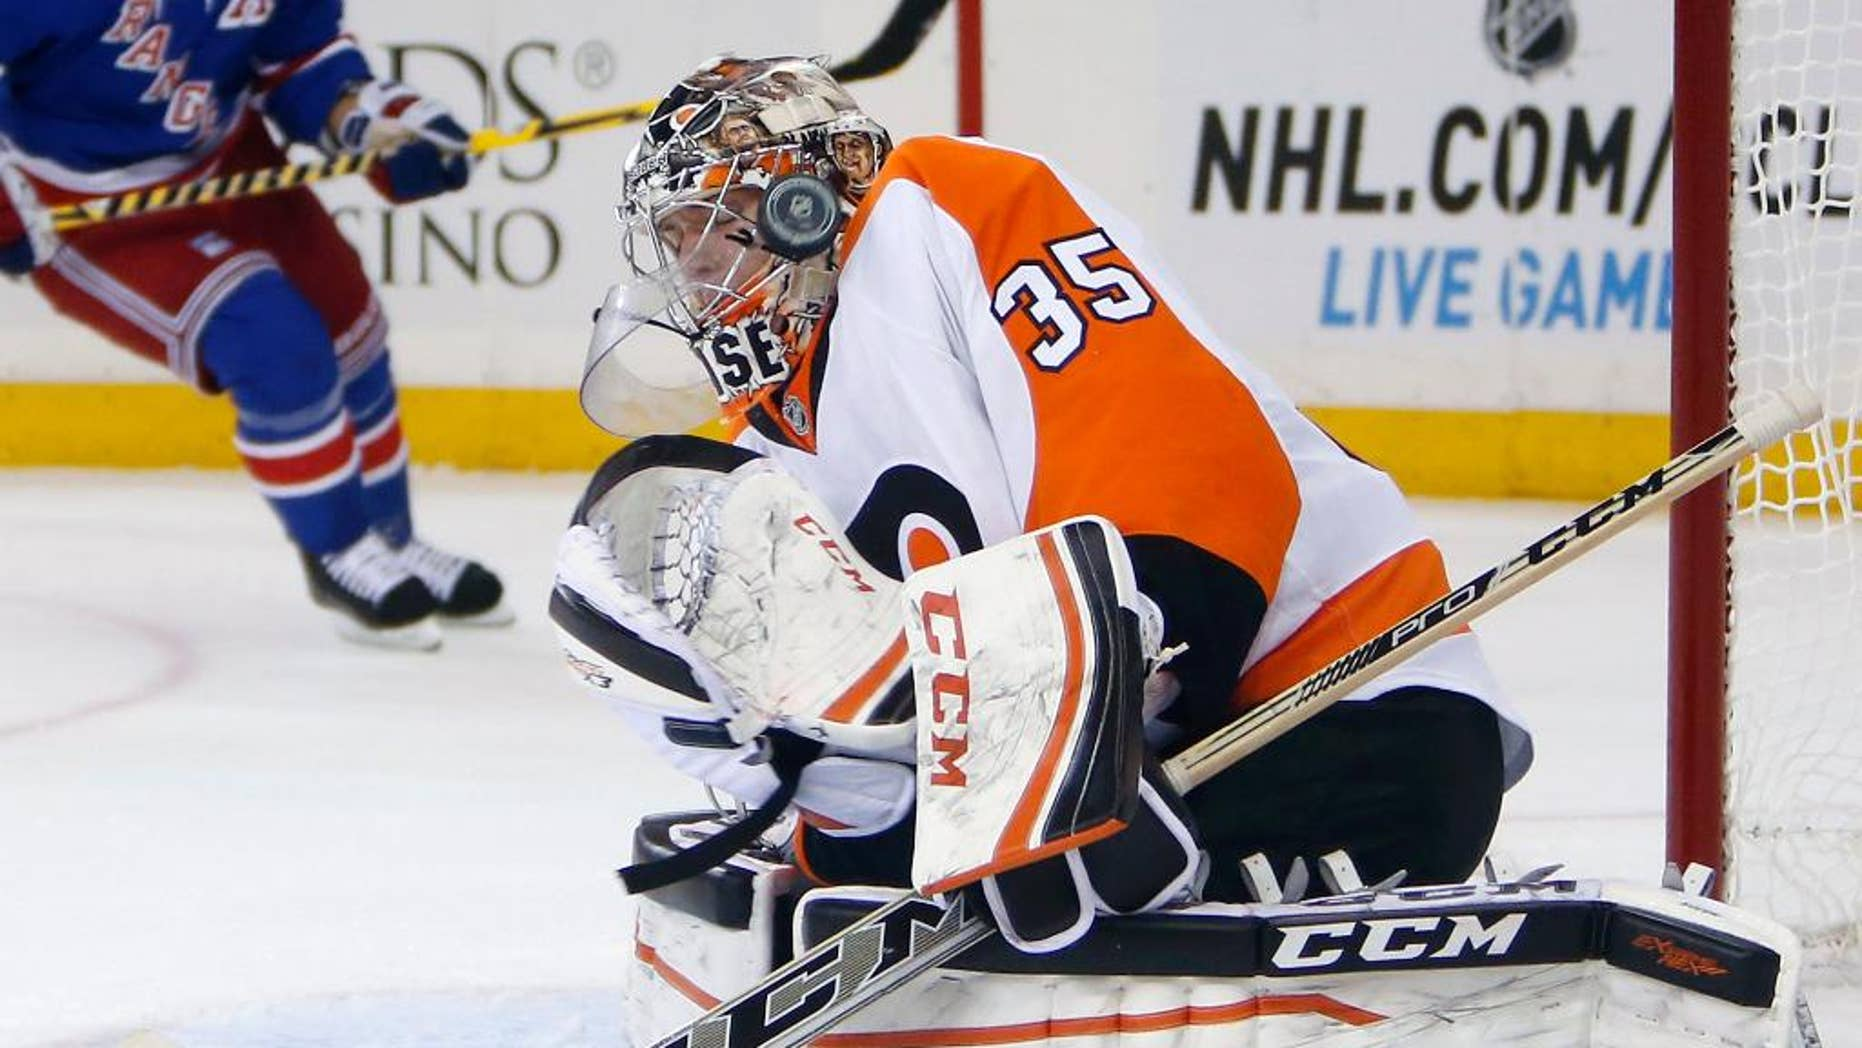 Philadelphia Flyers goalie Steve Mason (35) deflects a shot during the second period of an NHL preseason hockey game against the New York Rangers, Monday, Sept. 29, 2014, in New York. (AP Photo/Jason DeCrow)